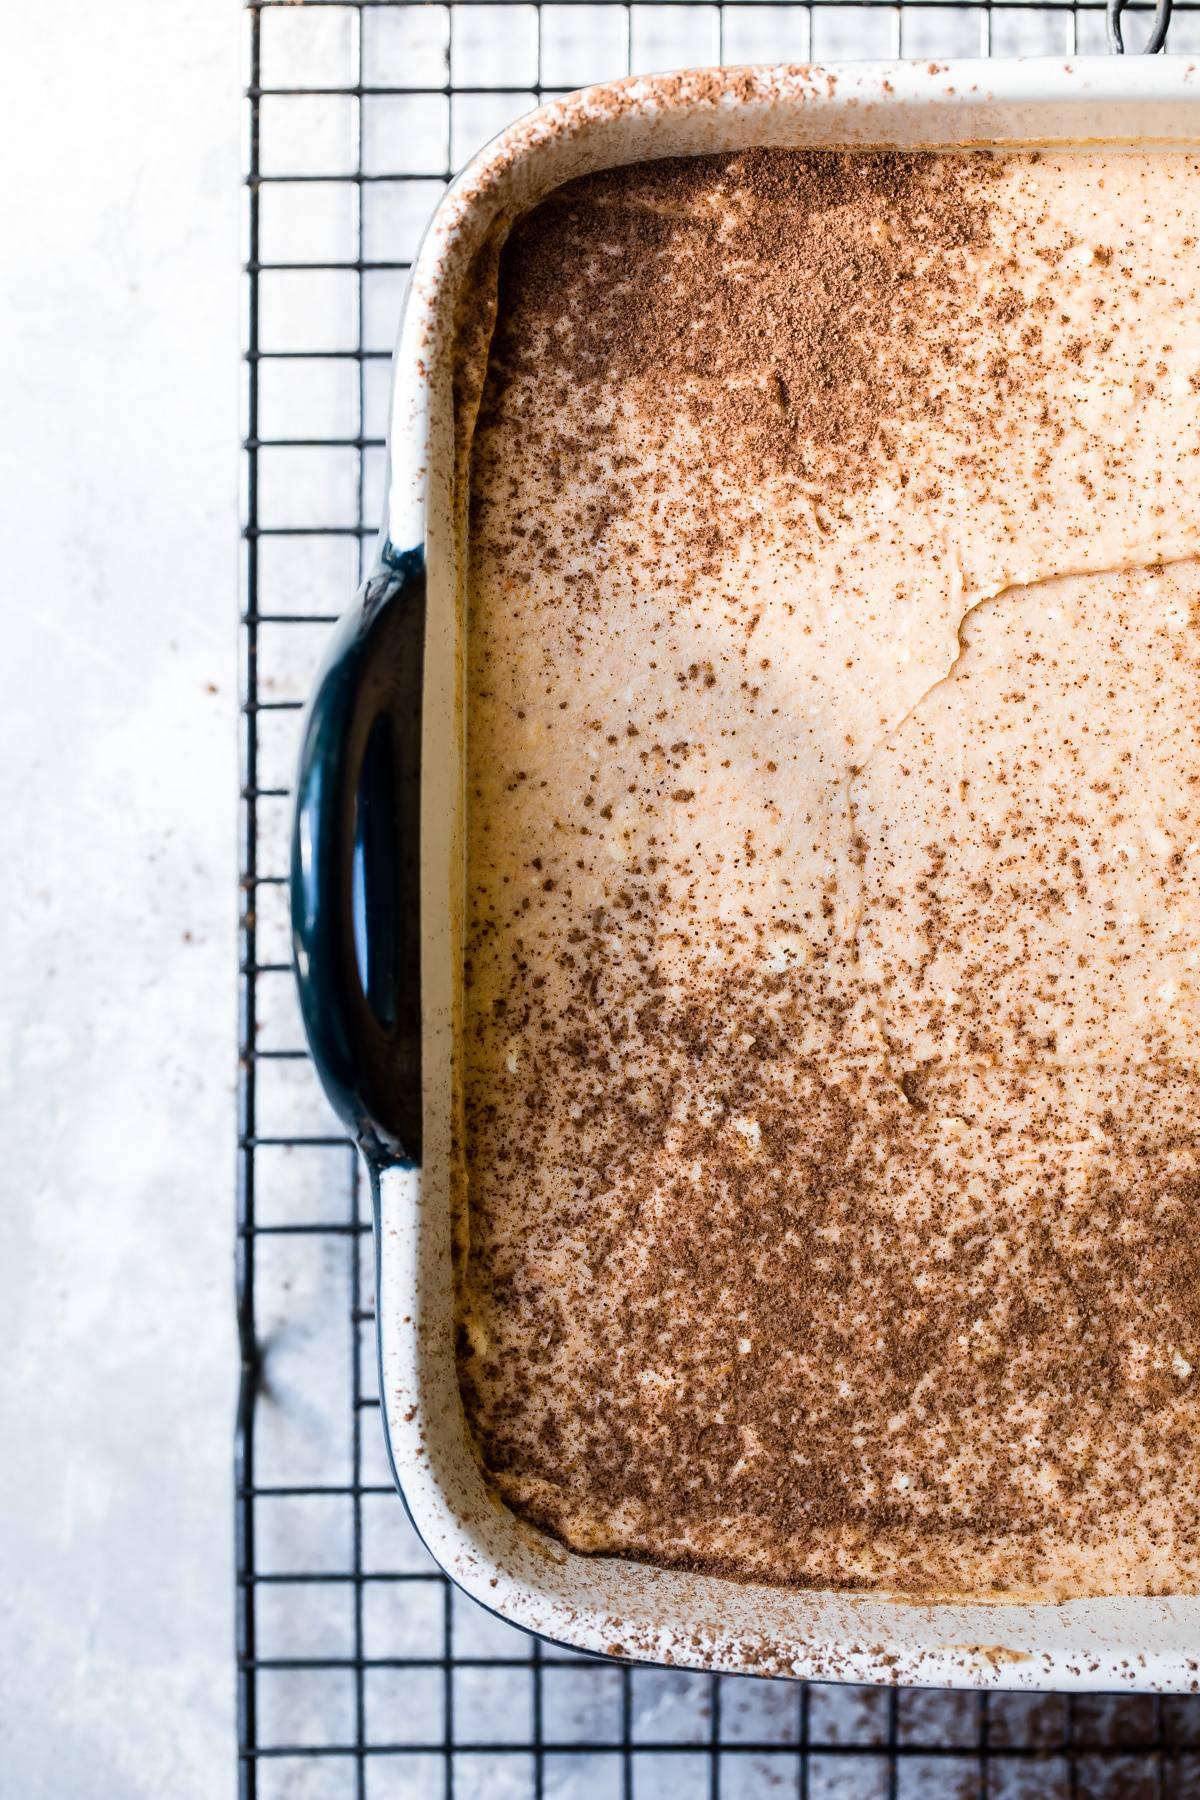 tiramisu in a baking dish